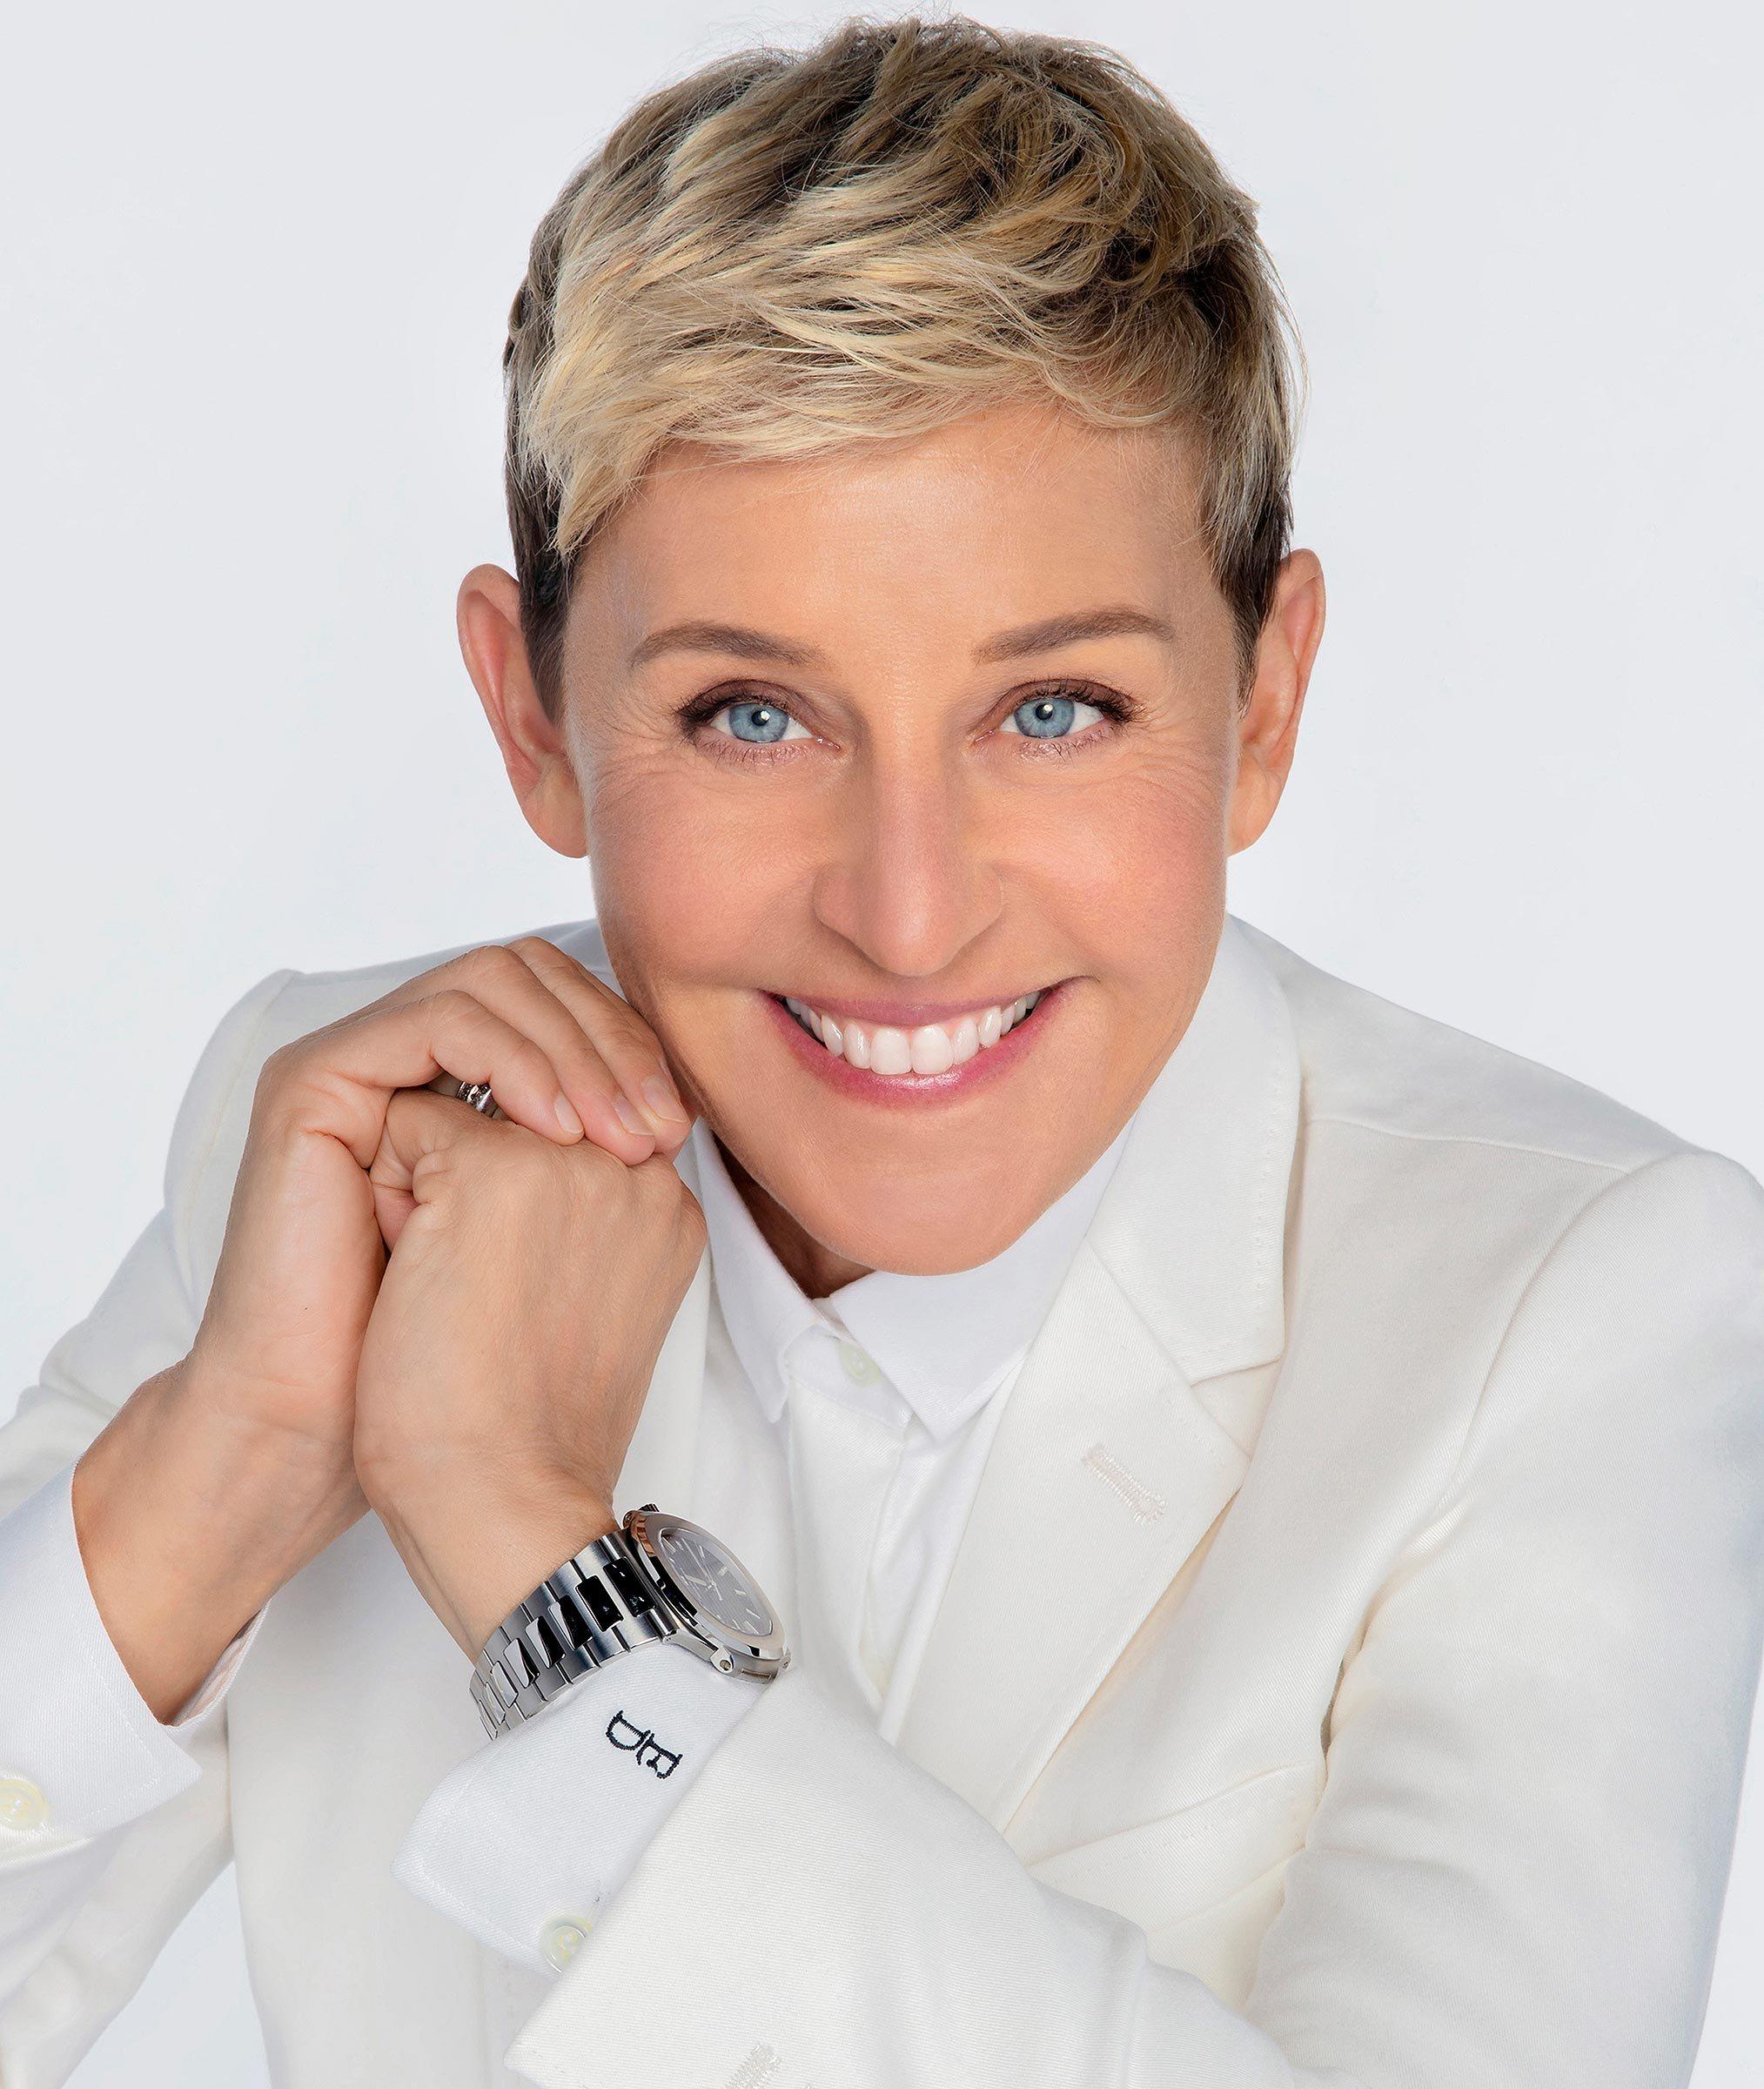 Ellen Degeneres Haircut New 2020